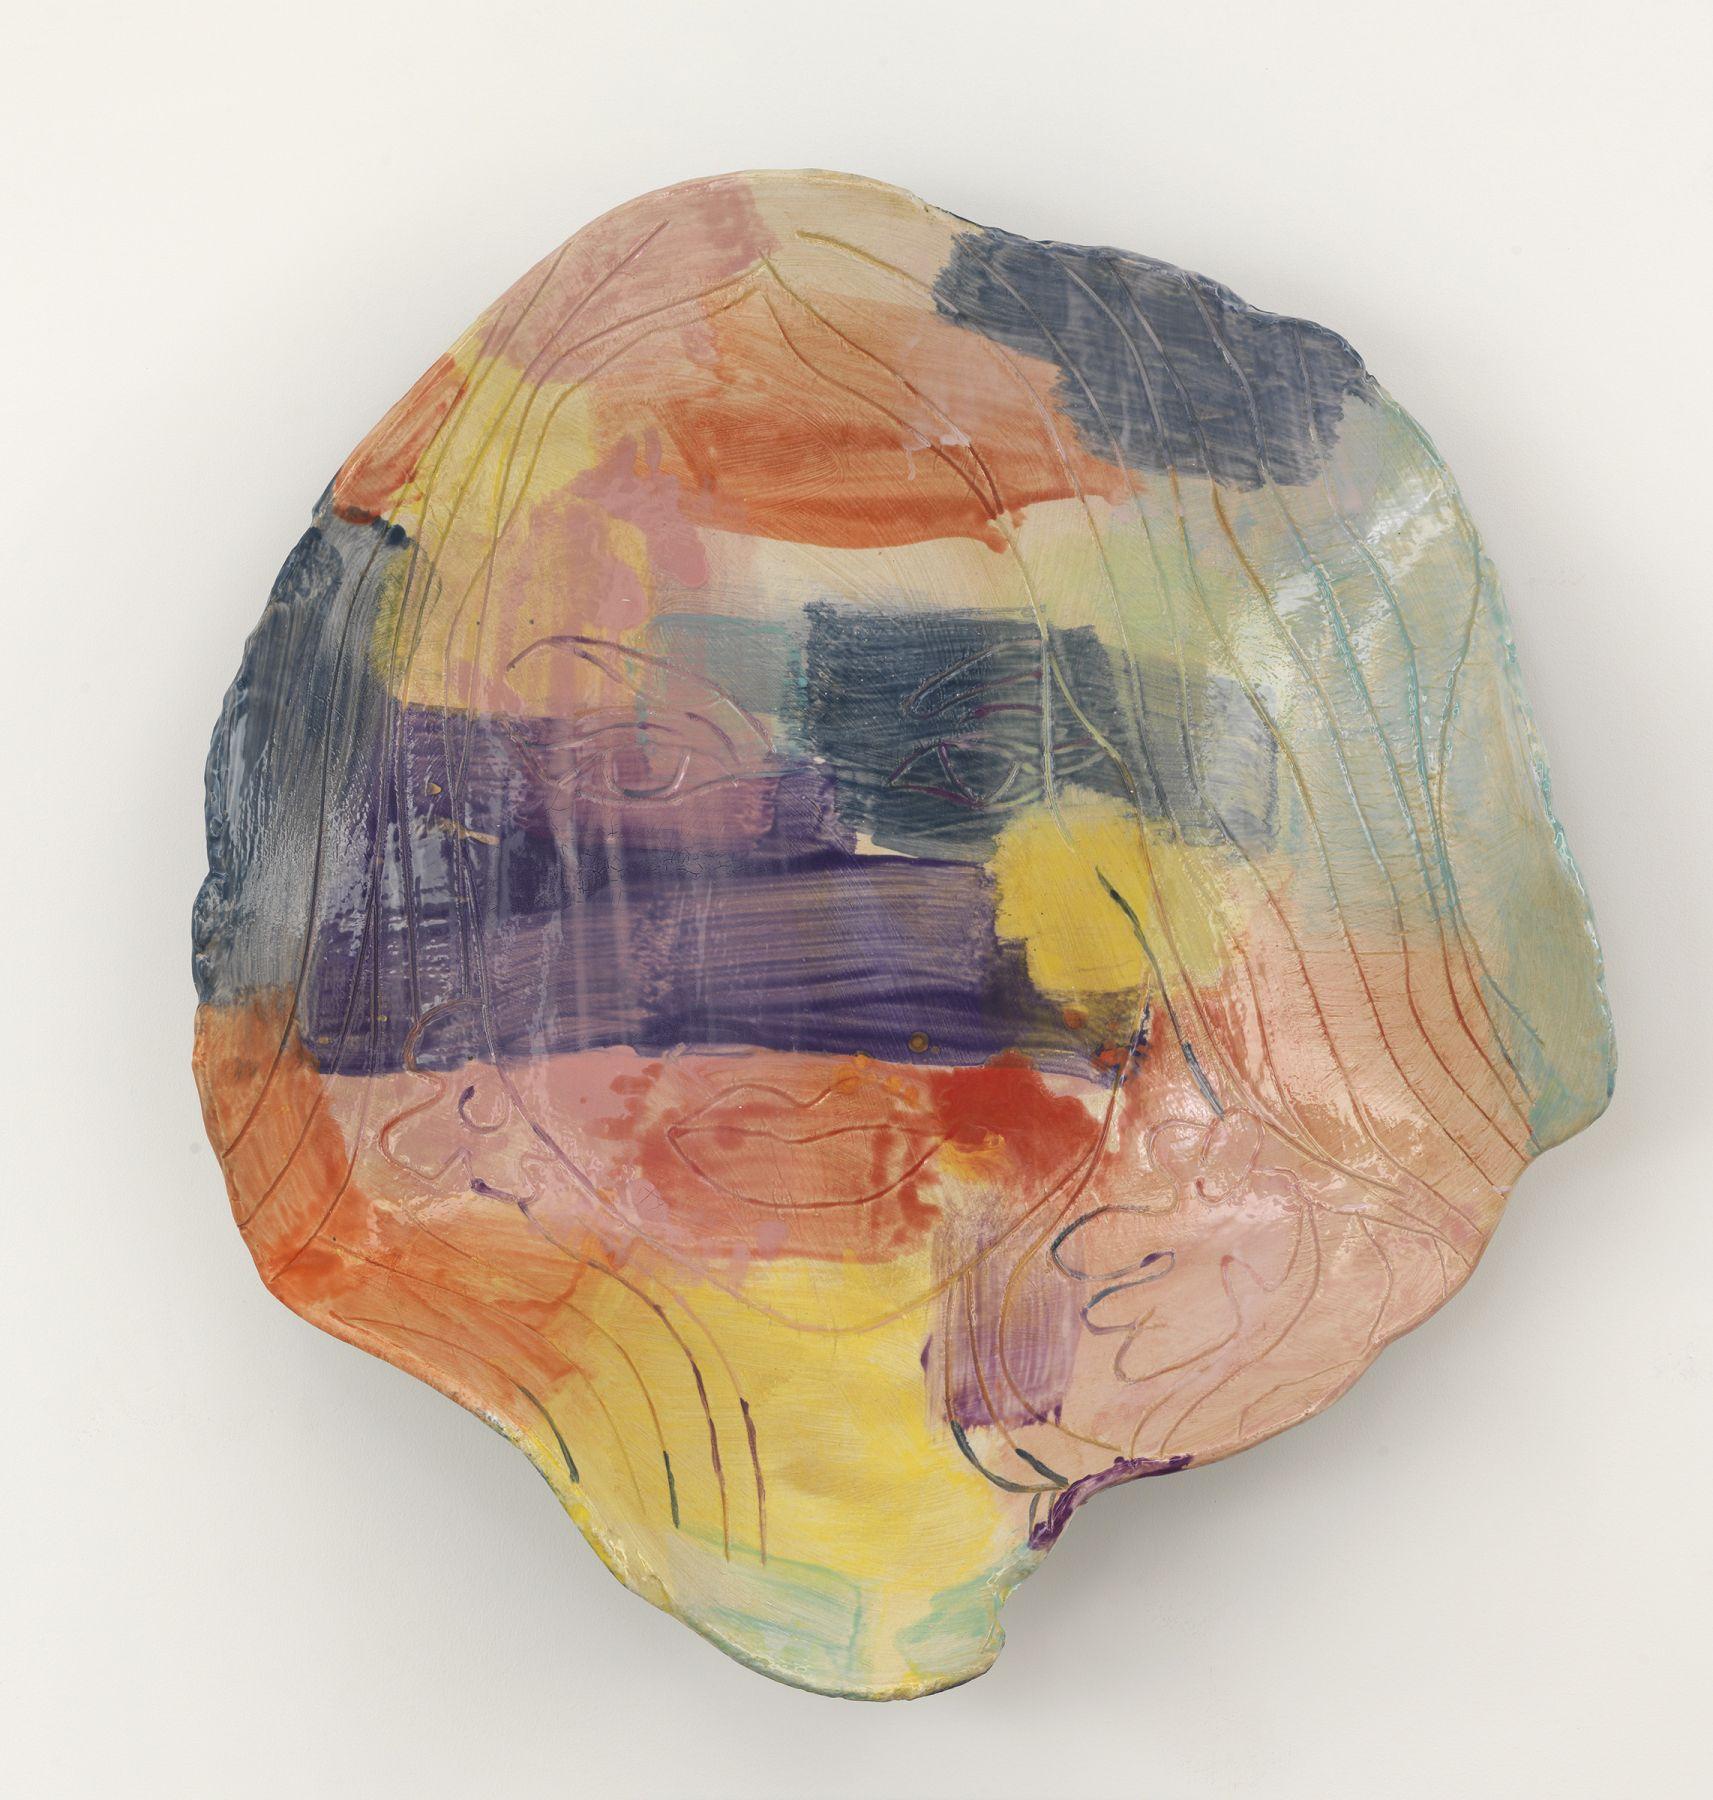 Ghada Amer, Homage à Gauguin , 2014